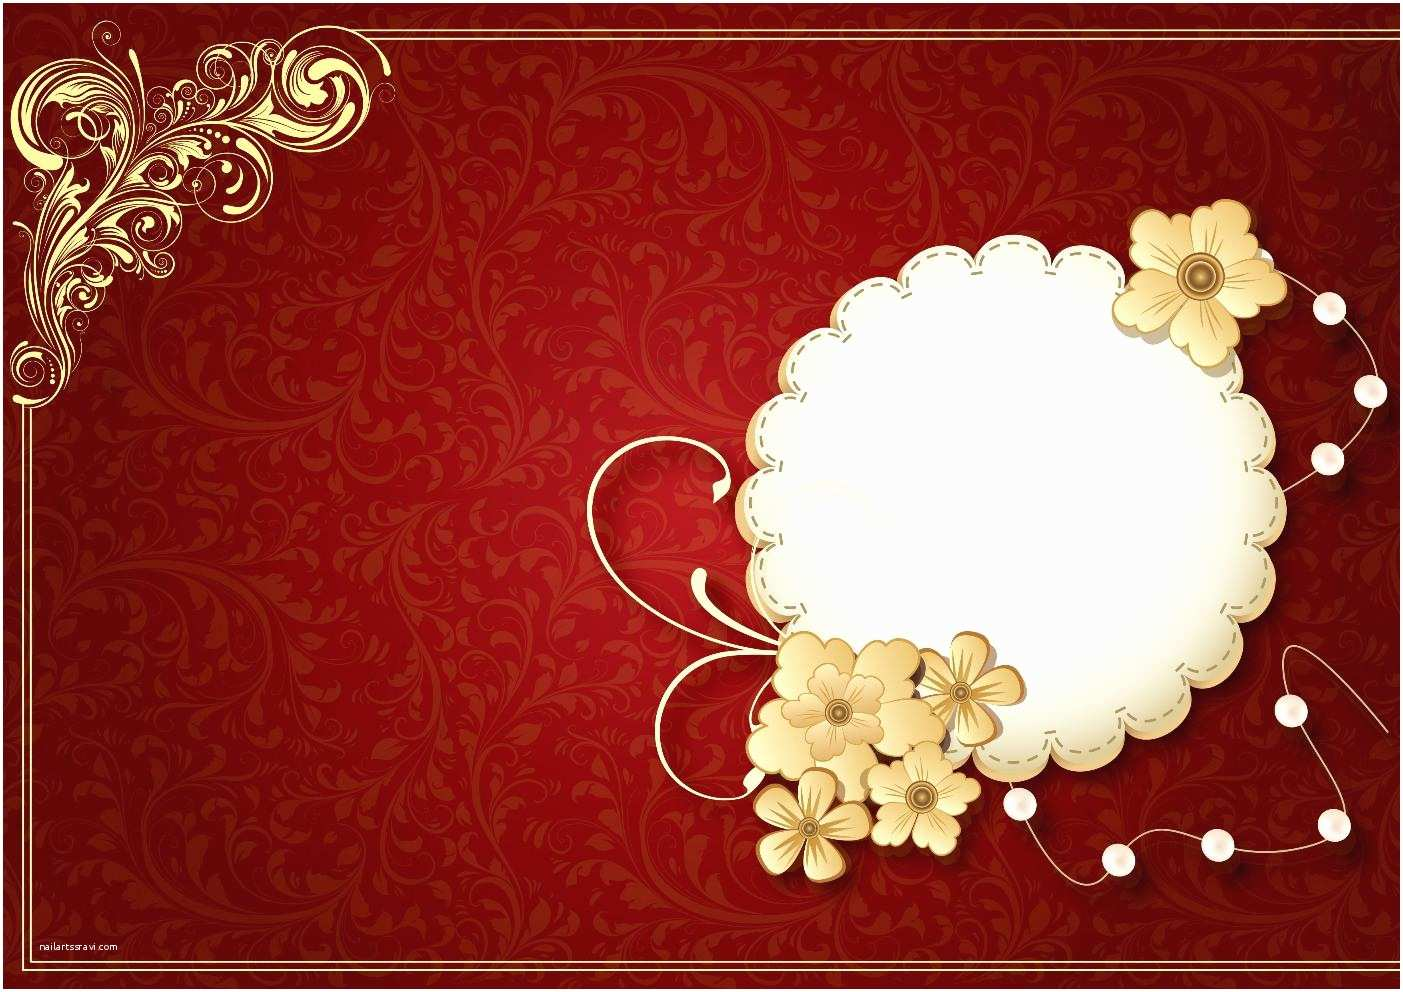 Wedding Invitation Designs Pakistani Wedding Invitation Cards Designs